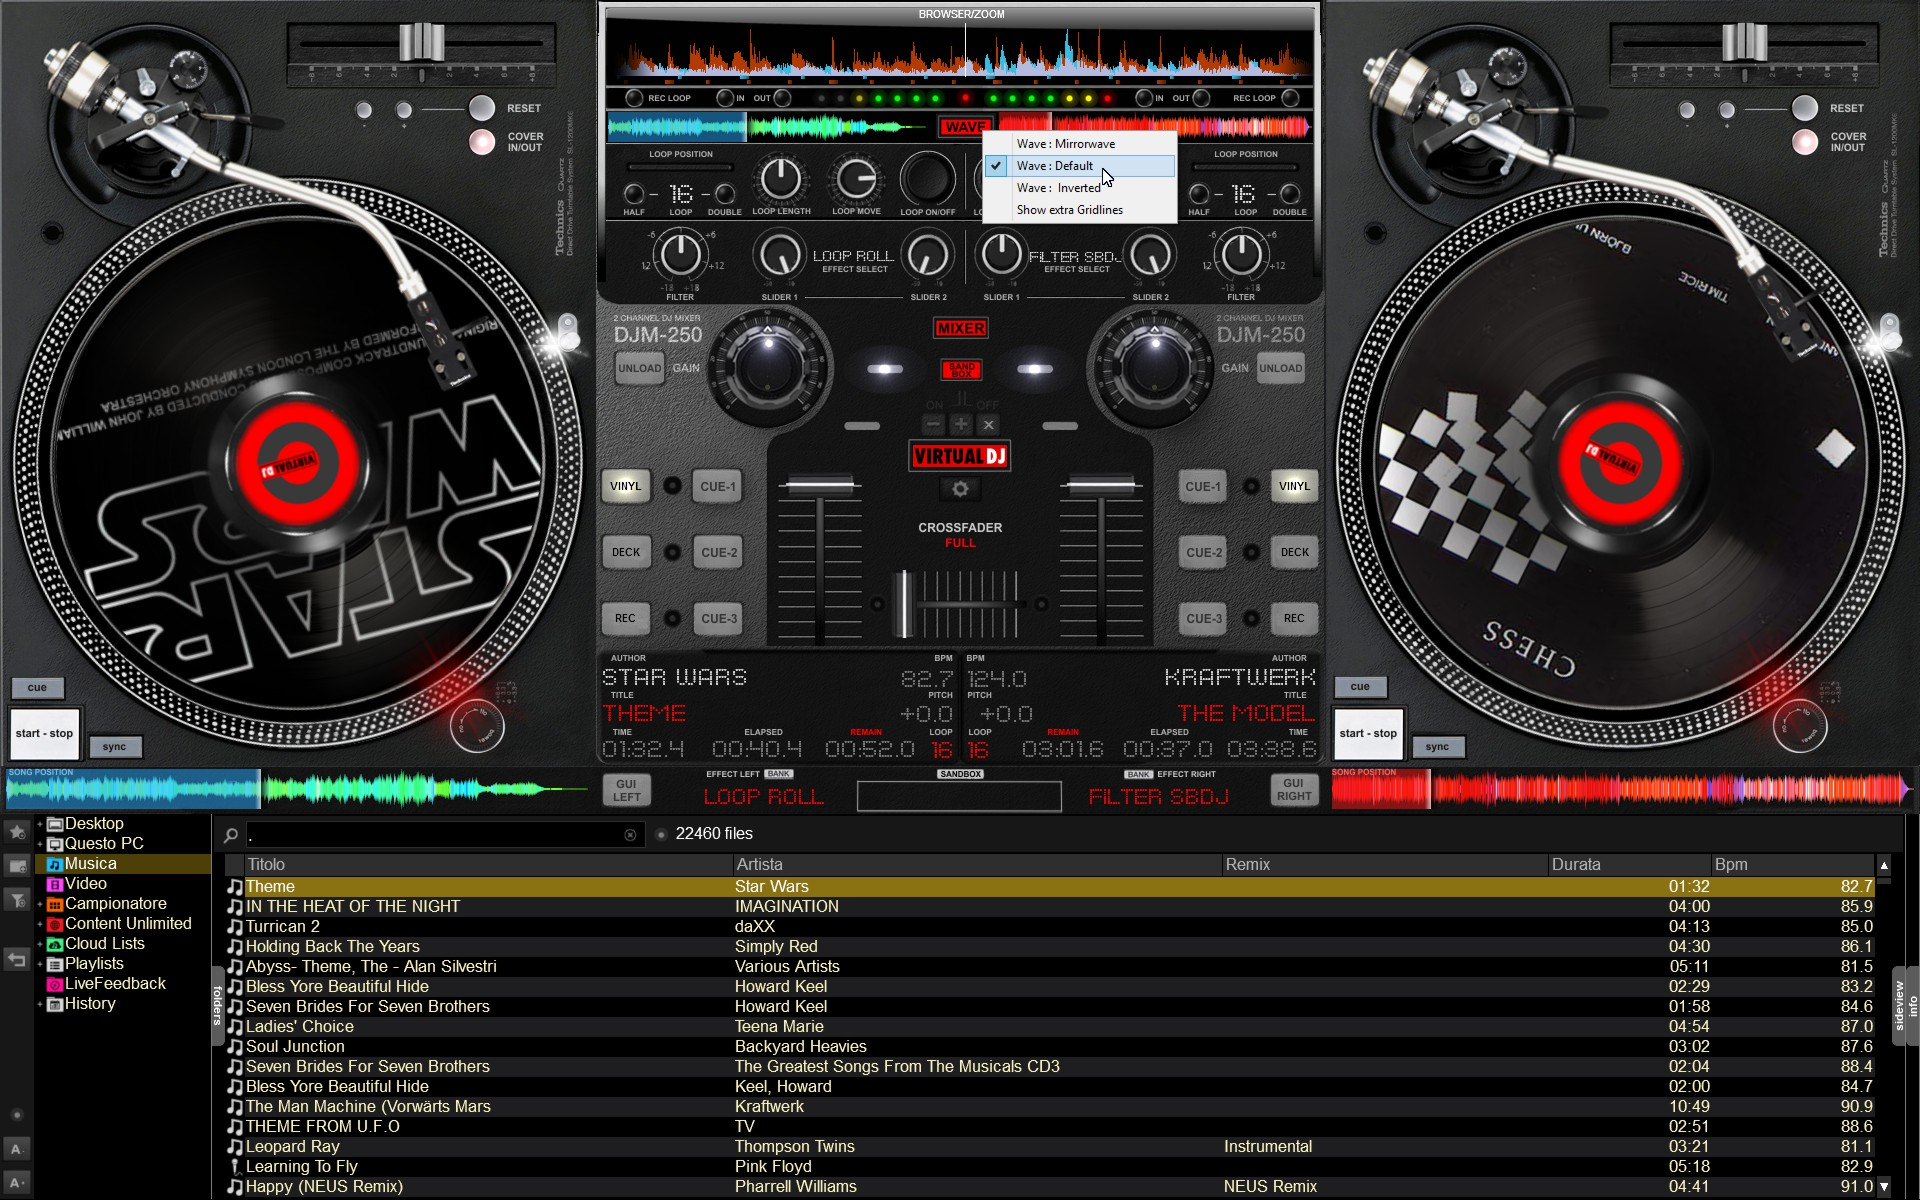 DOWNLOAD VIRTUAL DJ 8 SKIN PIONEER